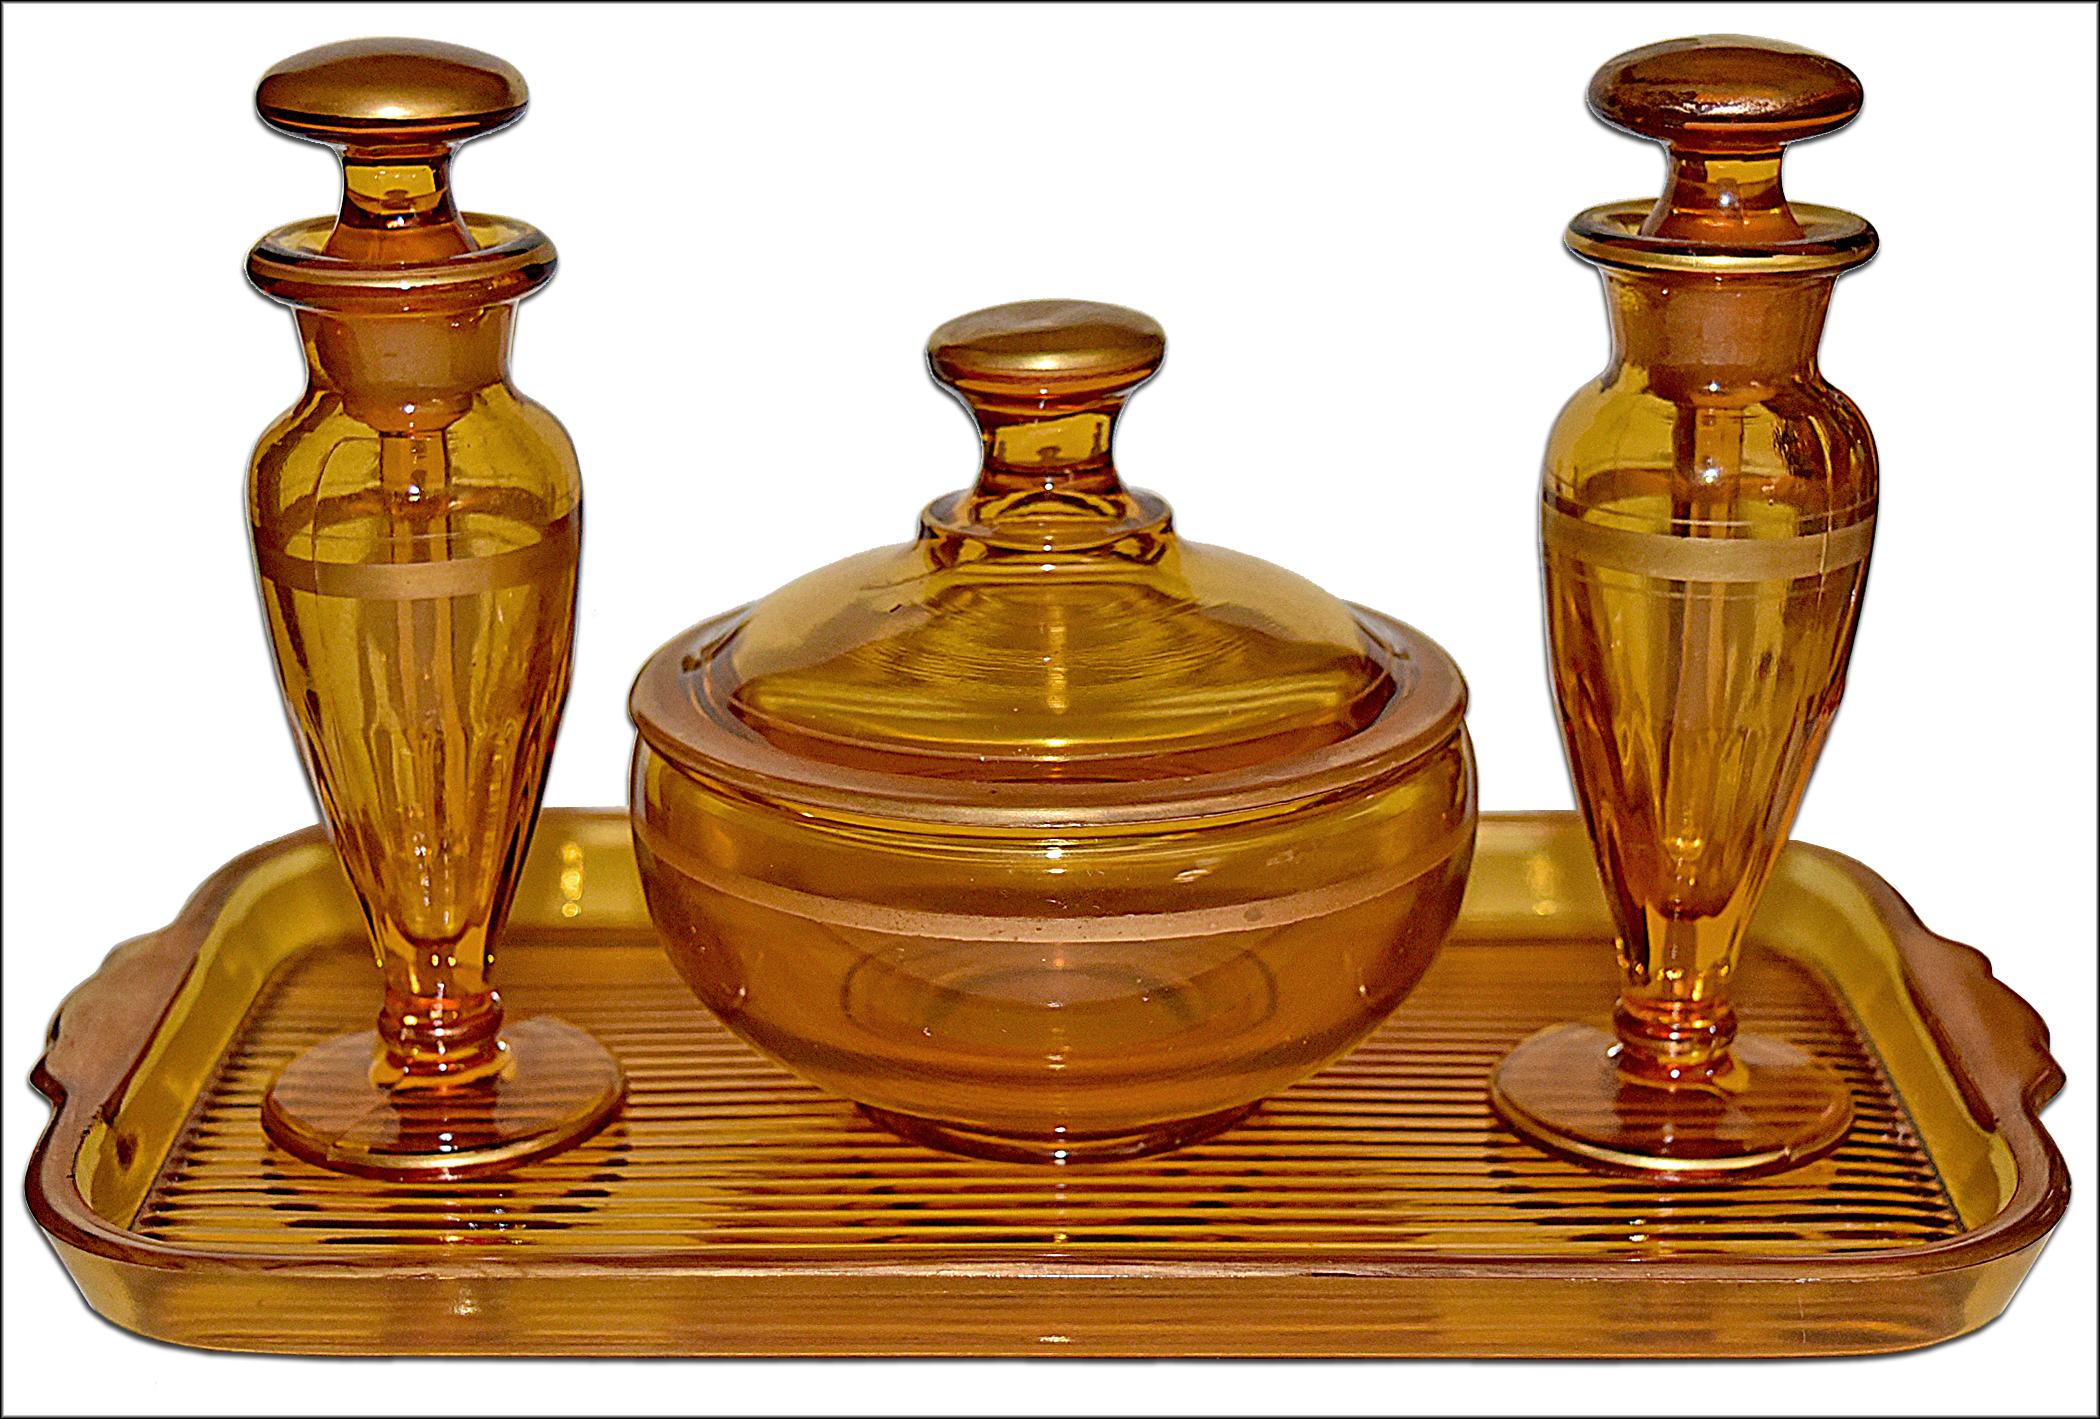 Diamond Adam's Rib Amber Vanity Set with Common Gold Decoration